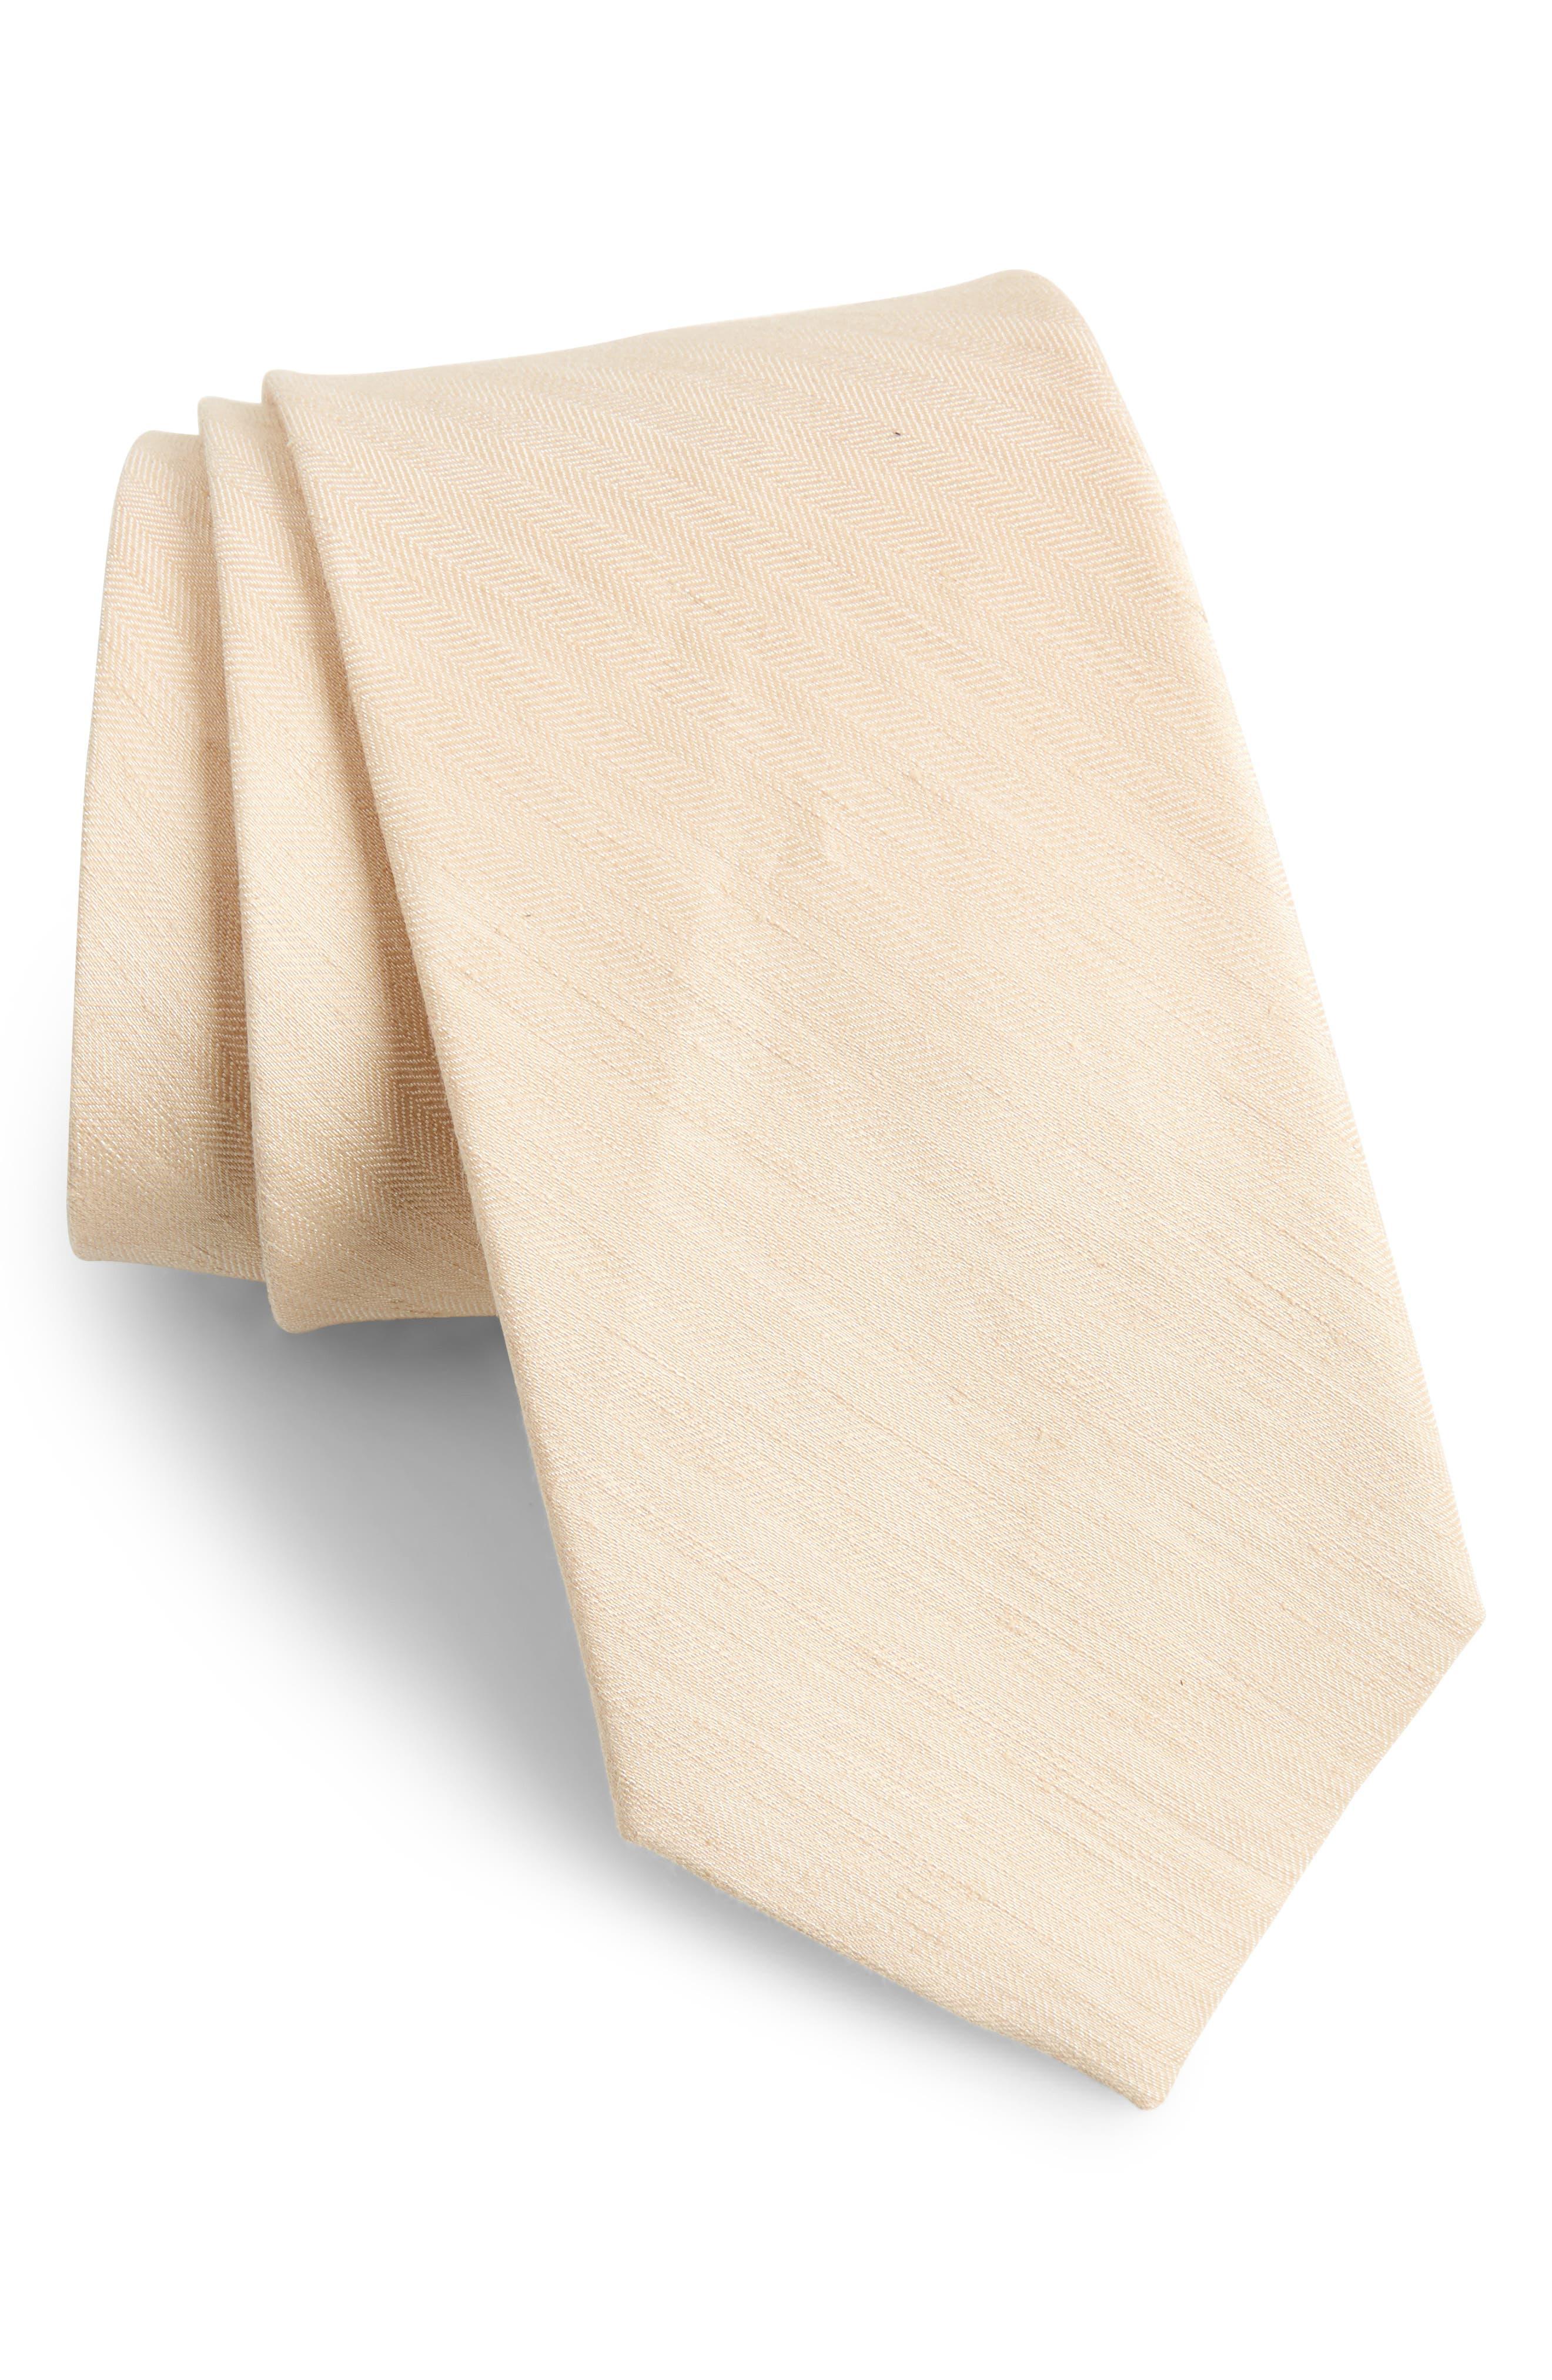 Alternate Image 1 Selected - The Tie Bar Linen Row Linen & Silk Tie (X-Long)